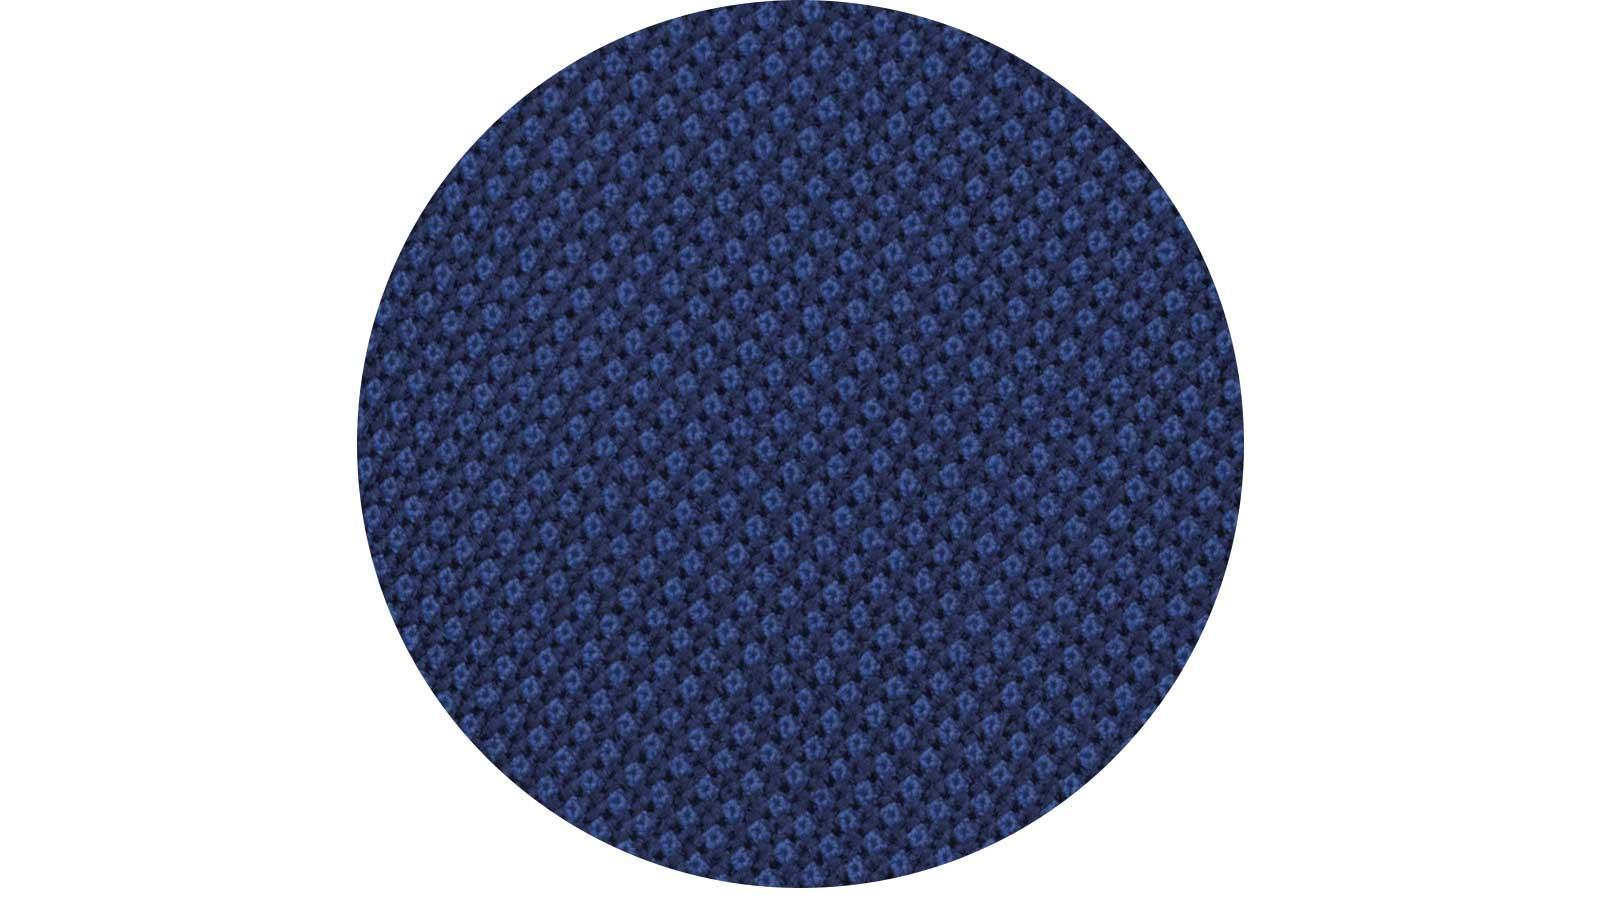 Sartorial Royal Blue Birdseye 160s Pants - slider image